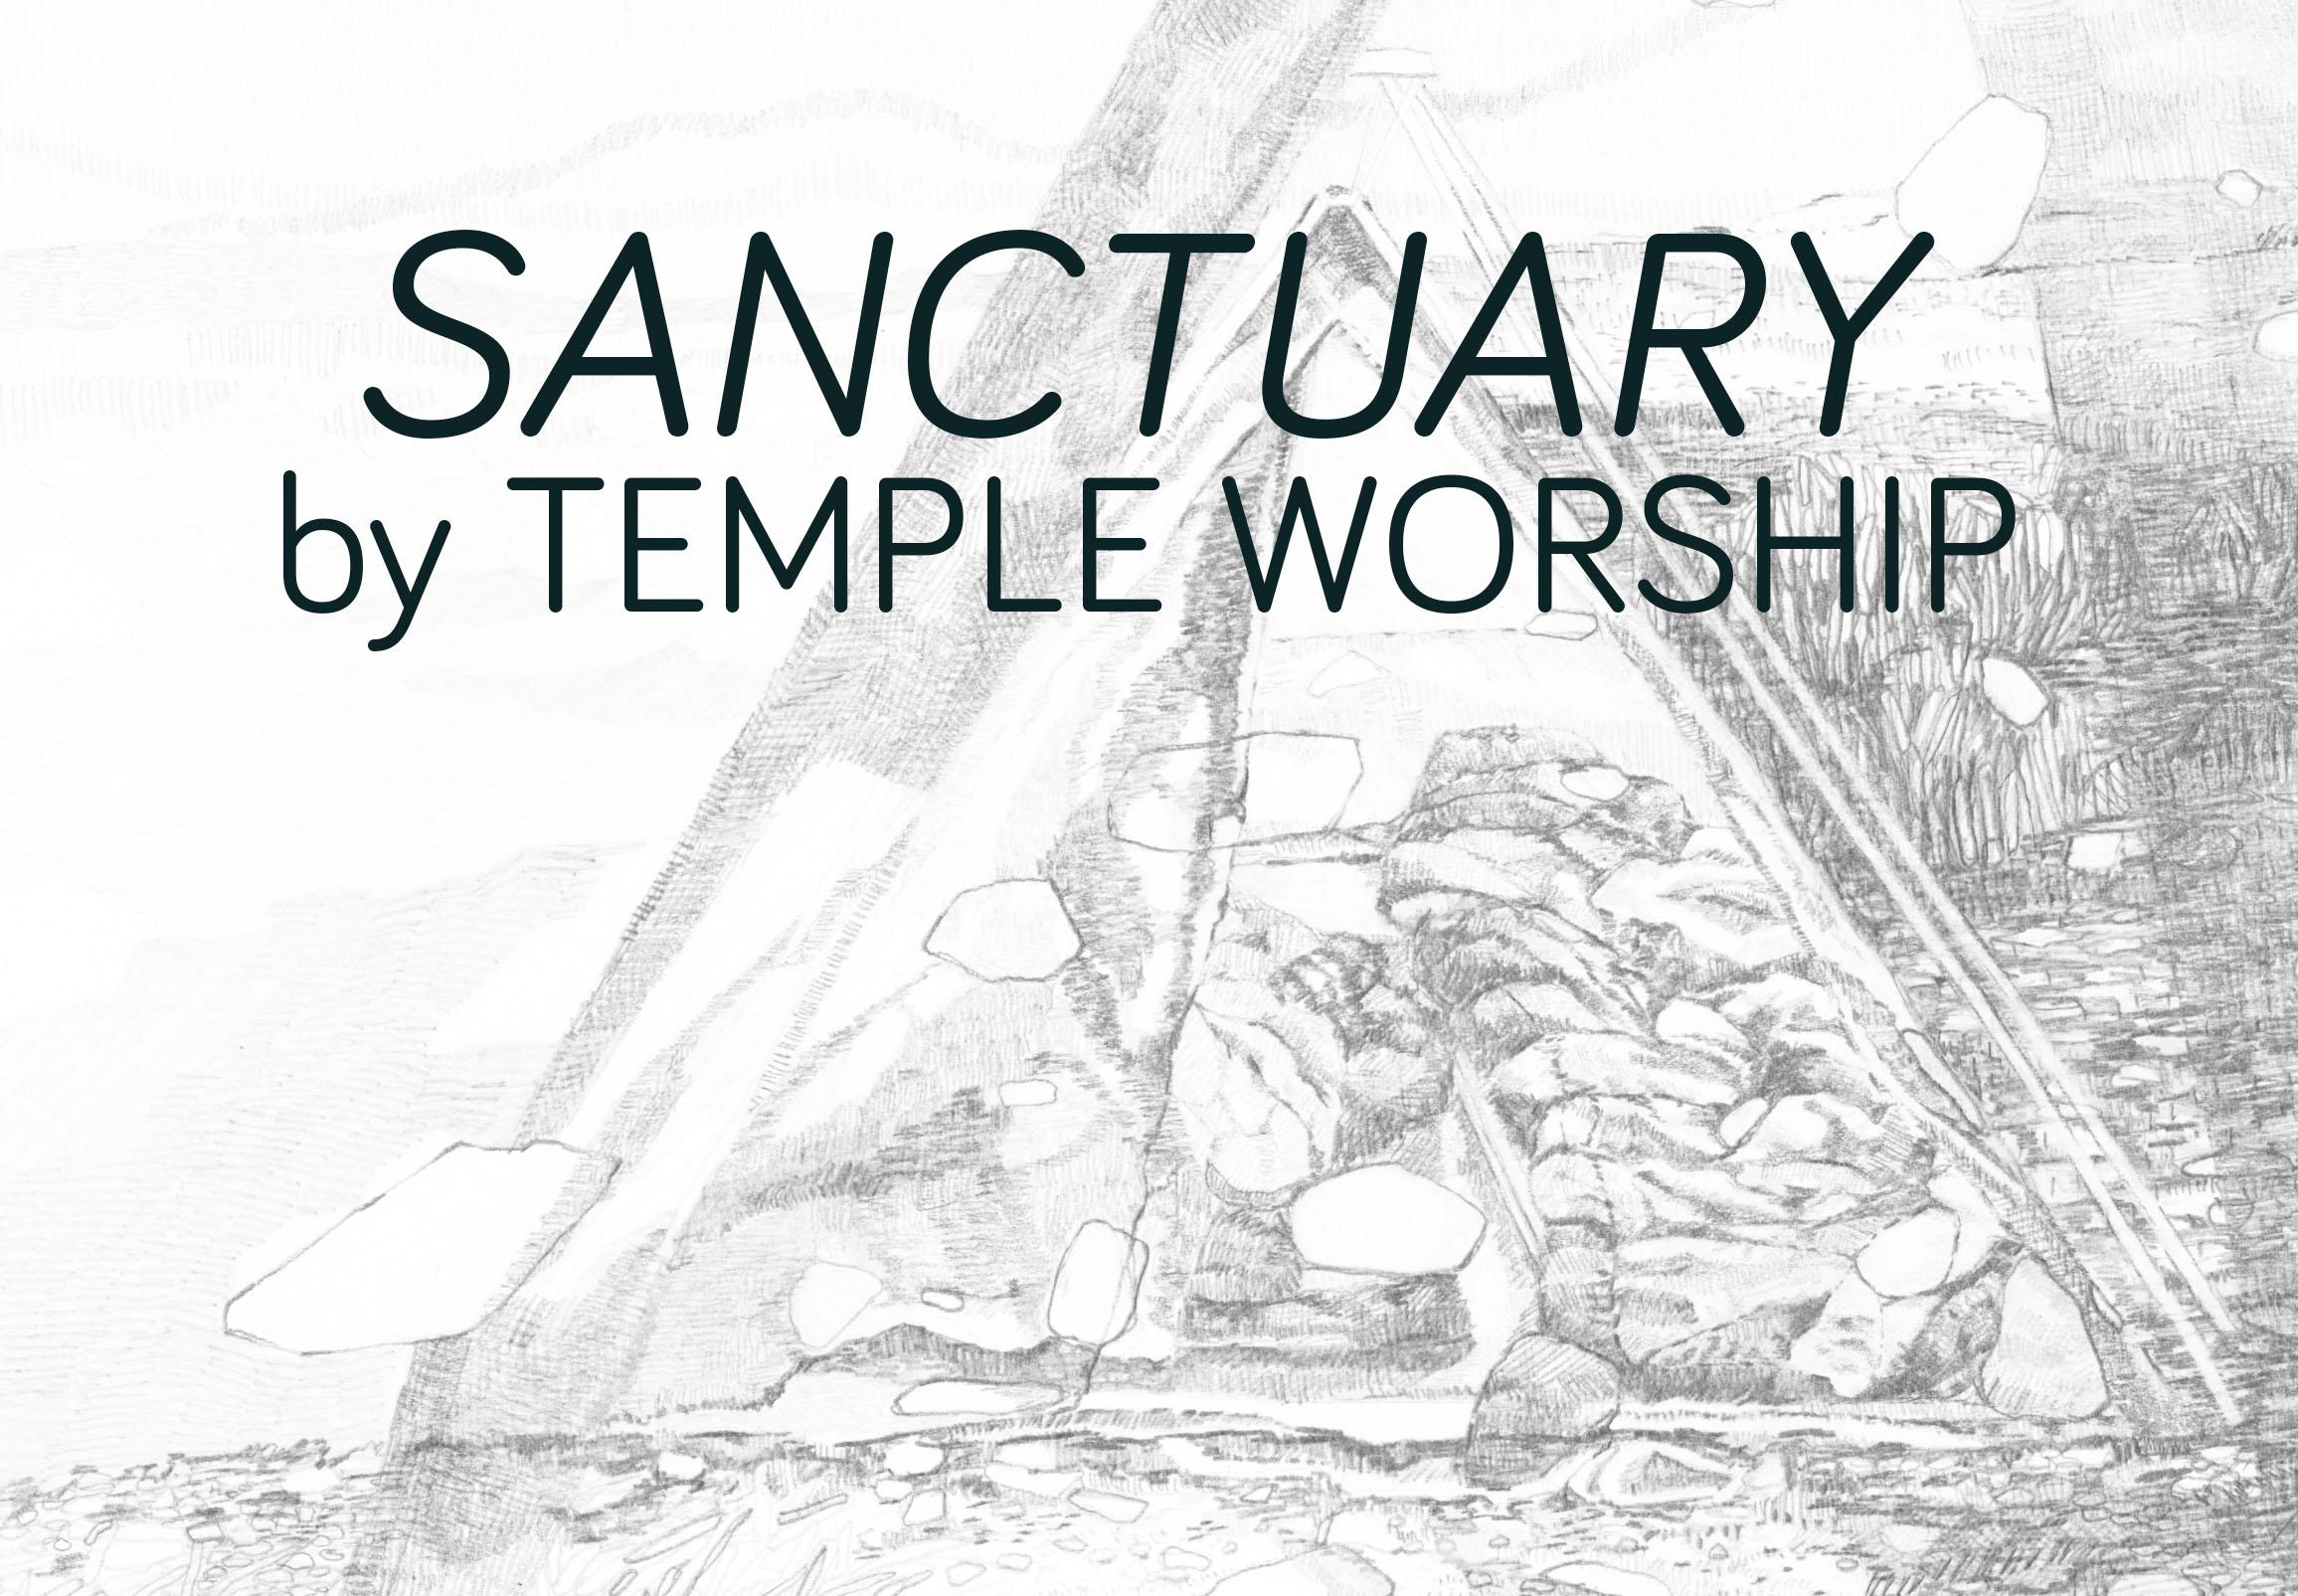 Temple_Worship_Sanctuary_music.jpg